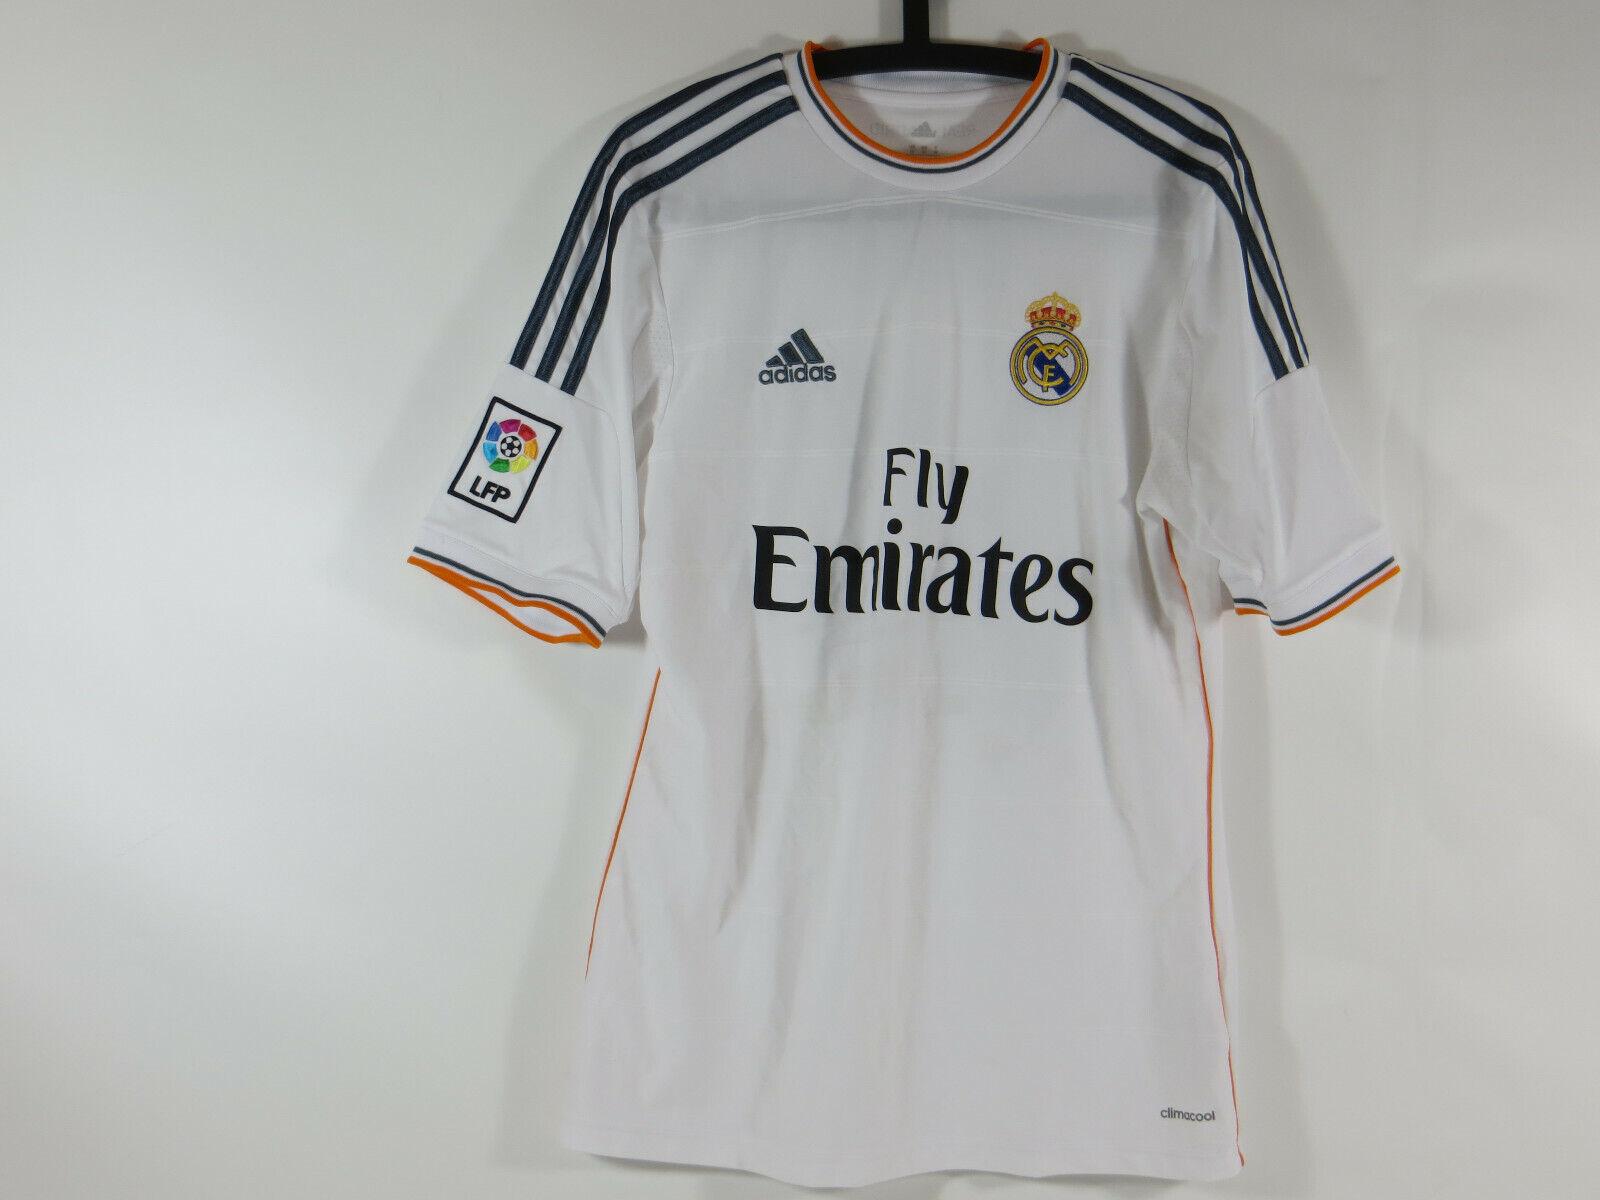 Real Madrid Trikot Größe M Adidas Jersey Maillot 10 ÖZIL Fly Emirates